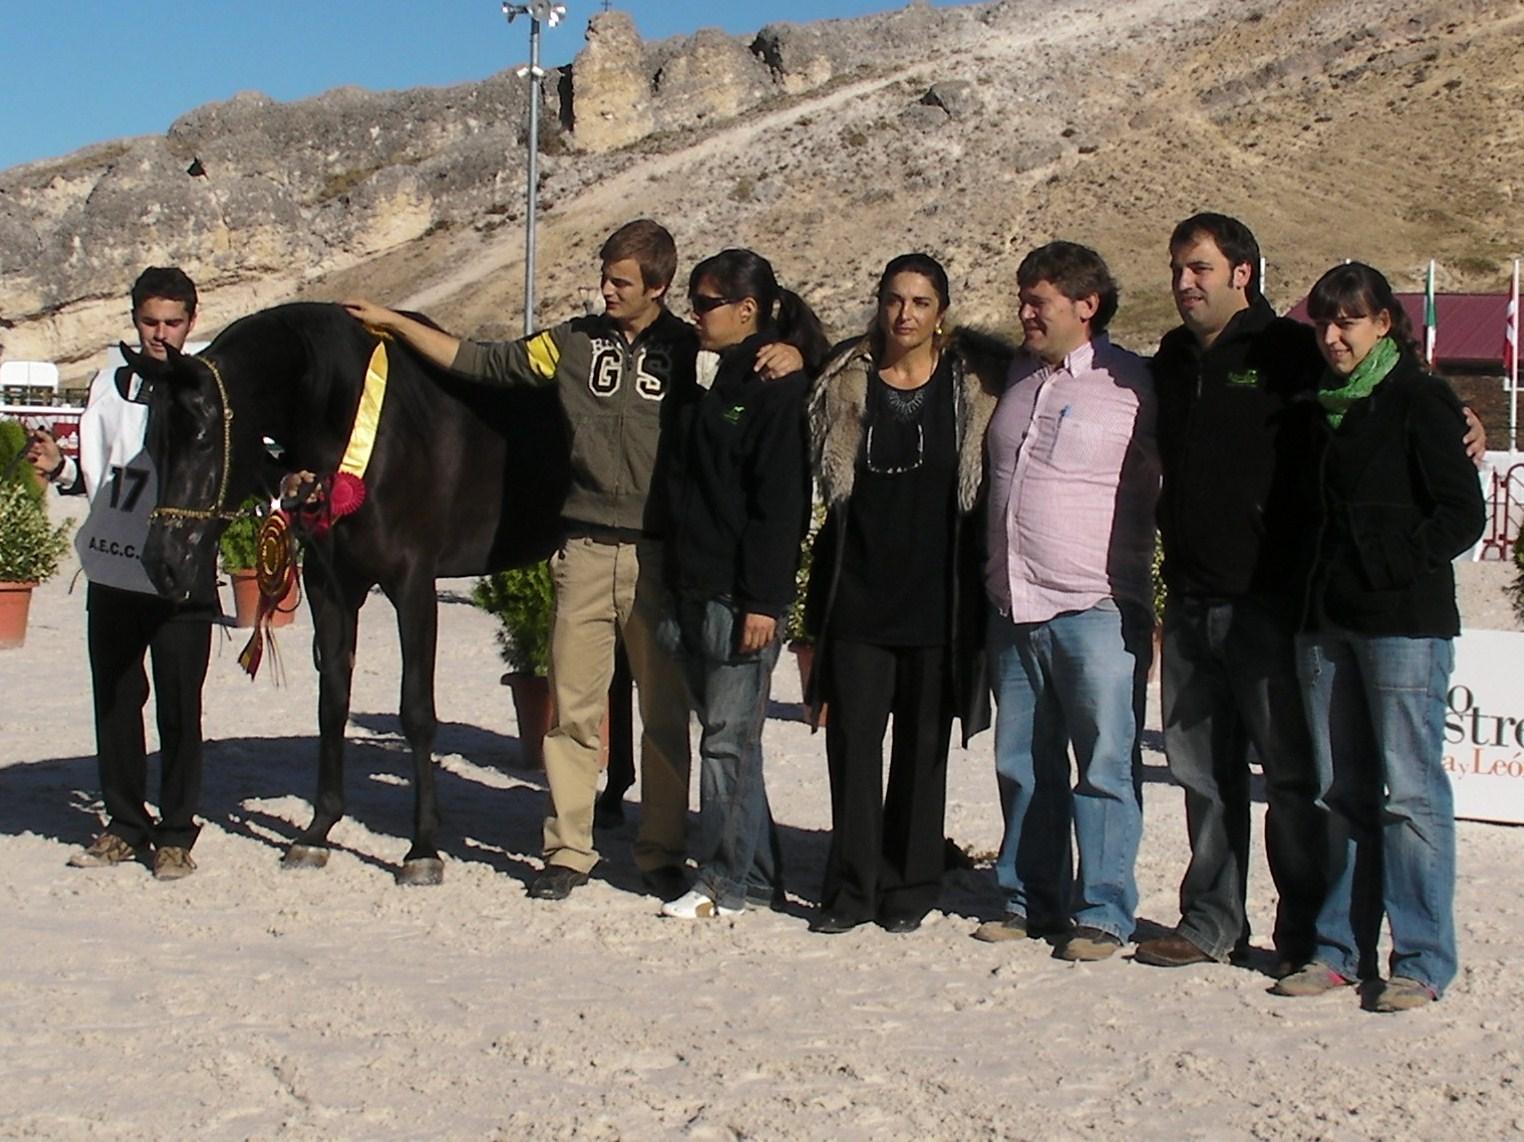 Campeonato nacional Segovia